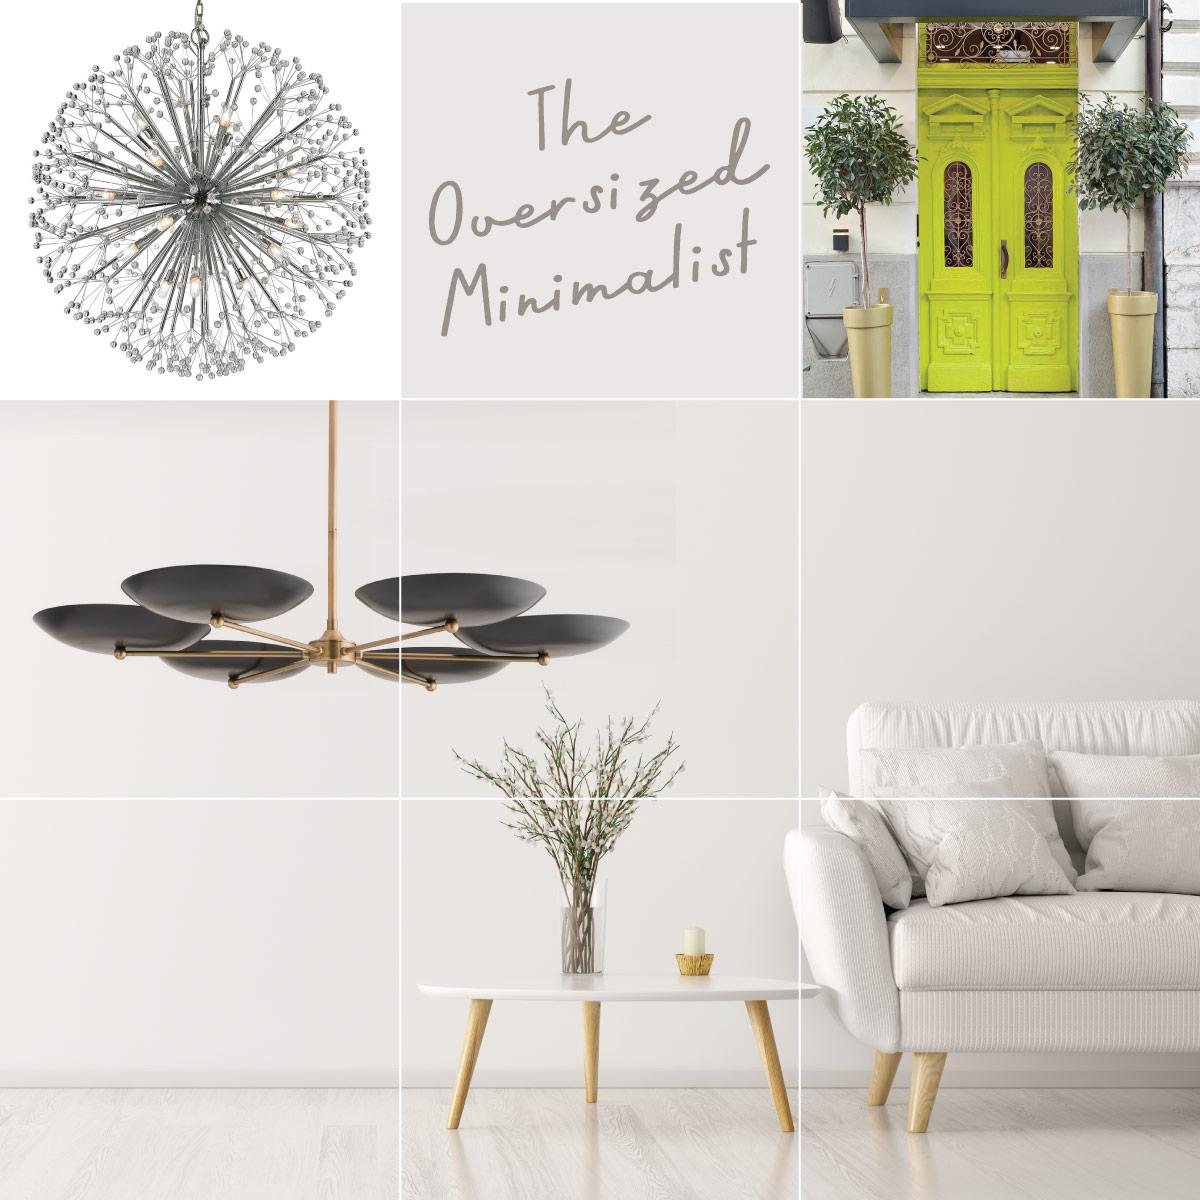 Minimalist Lighting Design